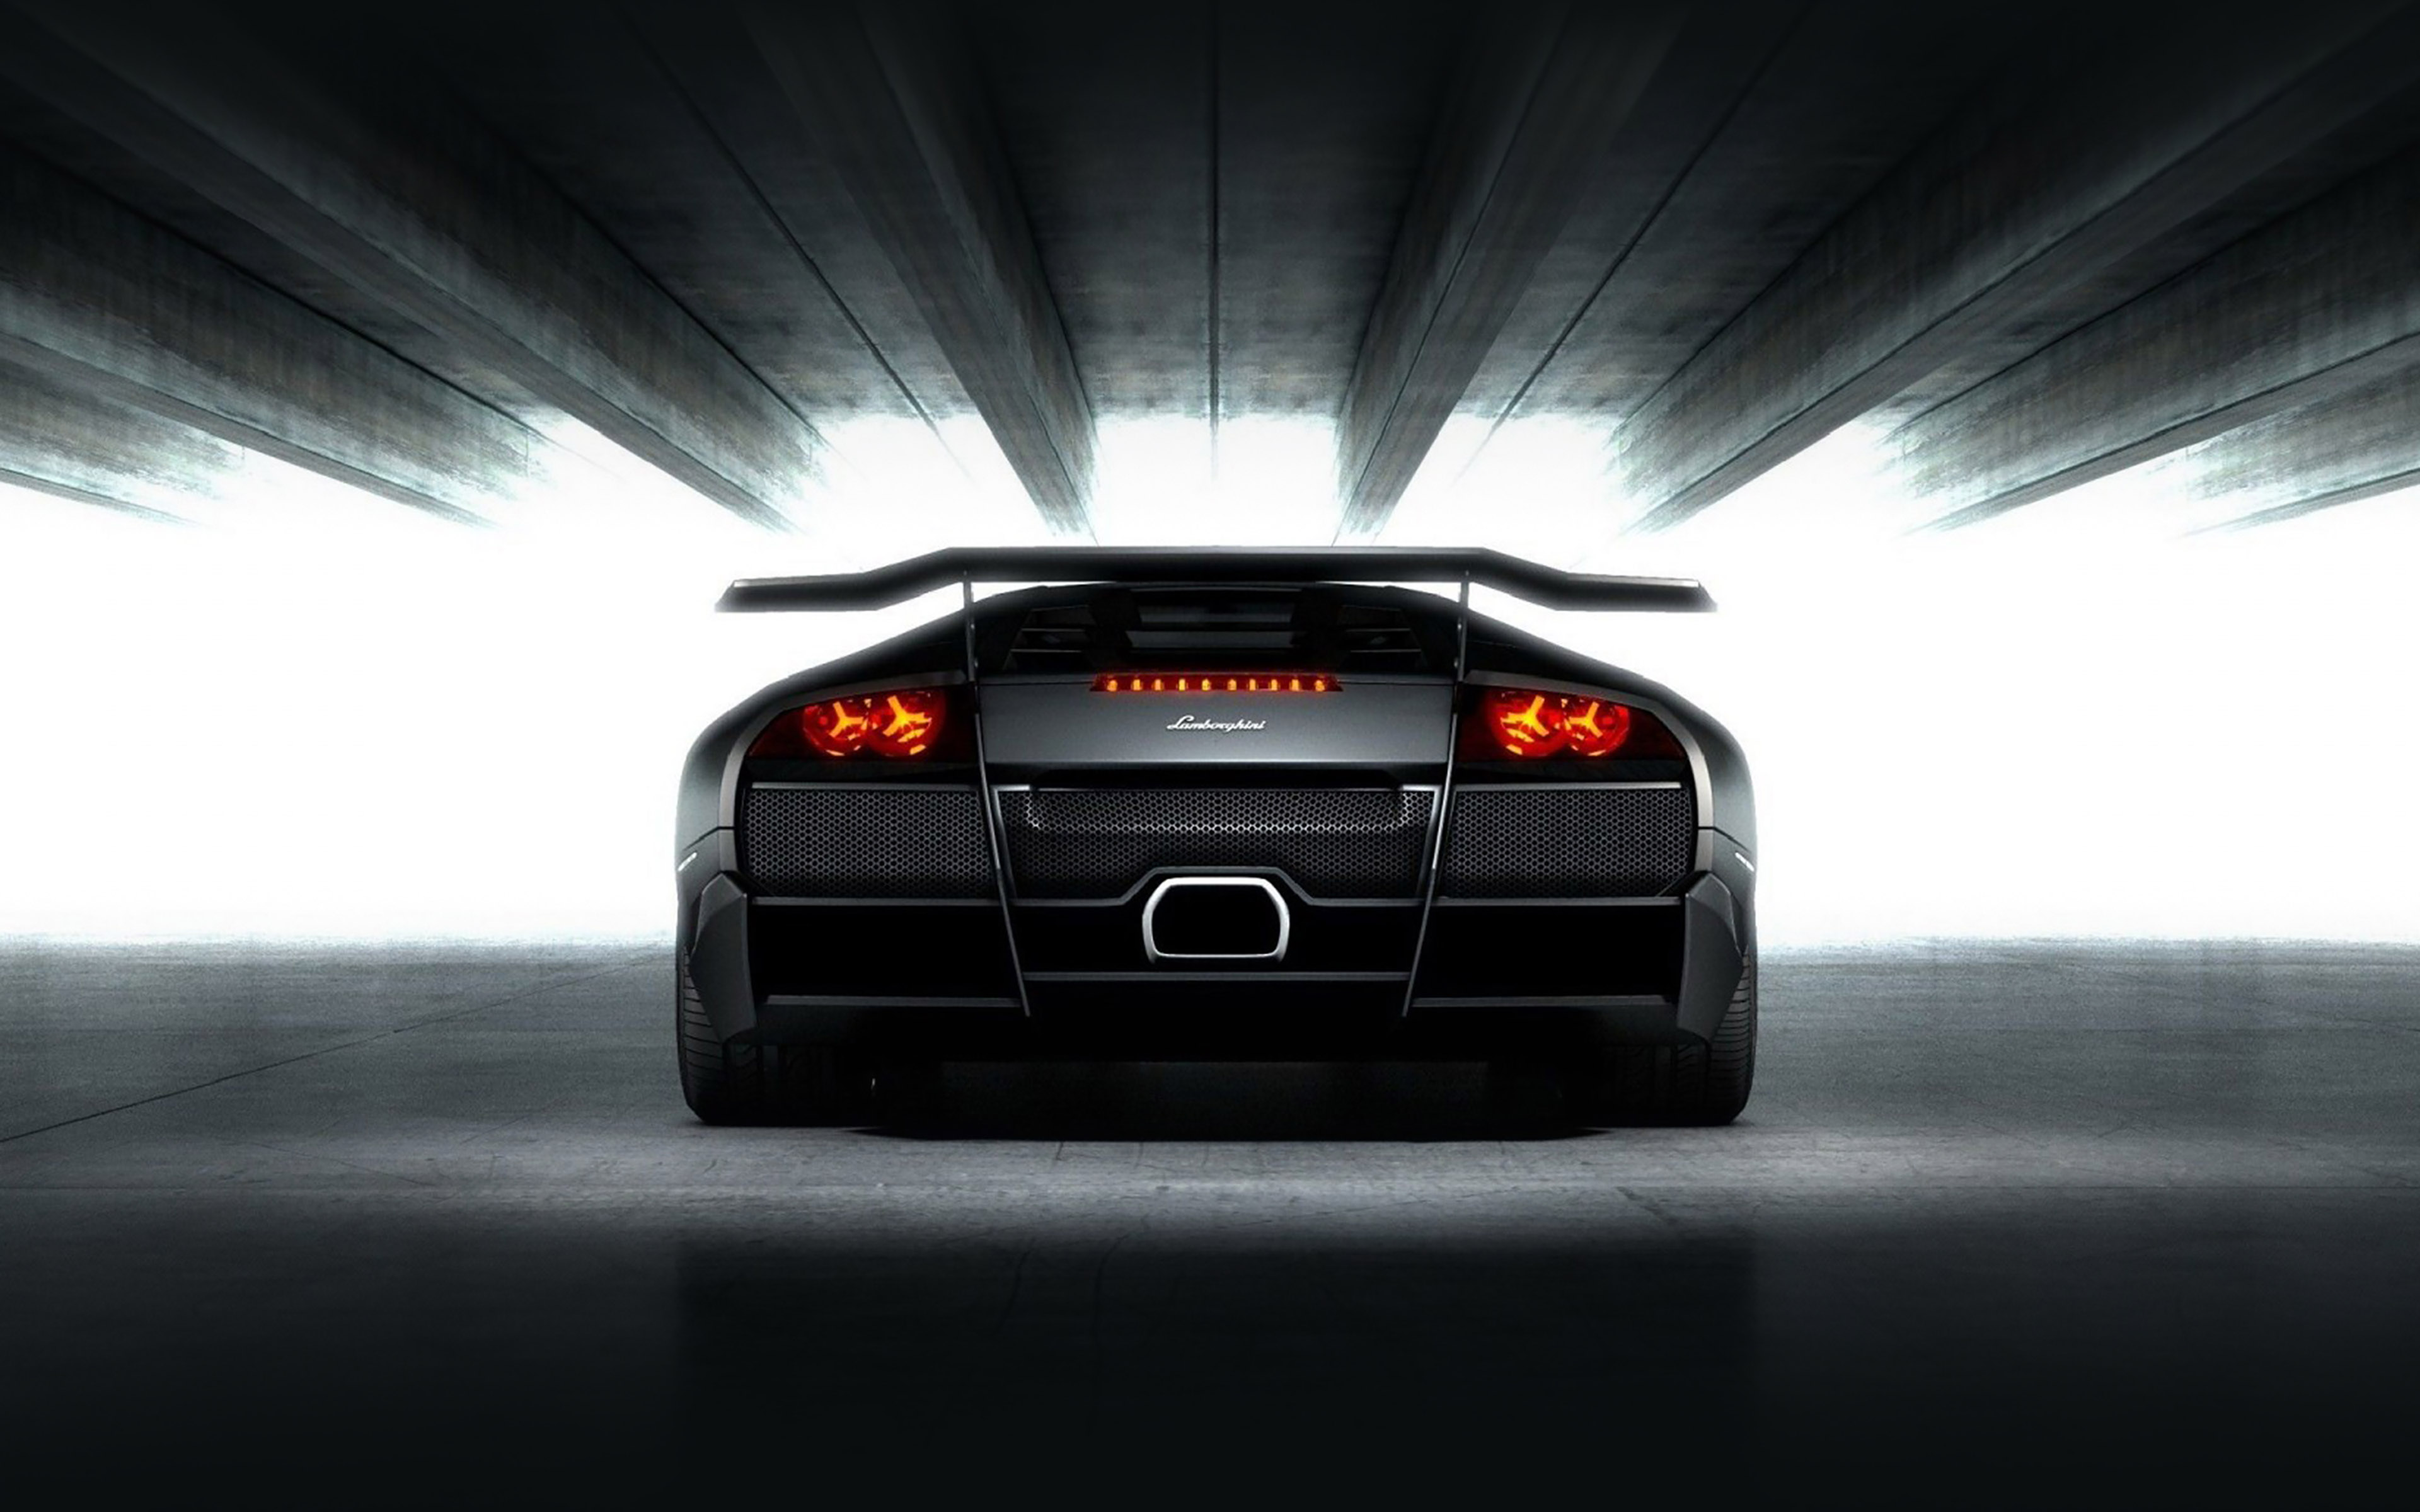 Rain Fall Hd Wallpaper Me64 Lamborghini In My Garage Car Papers Co